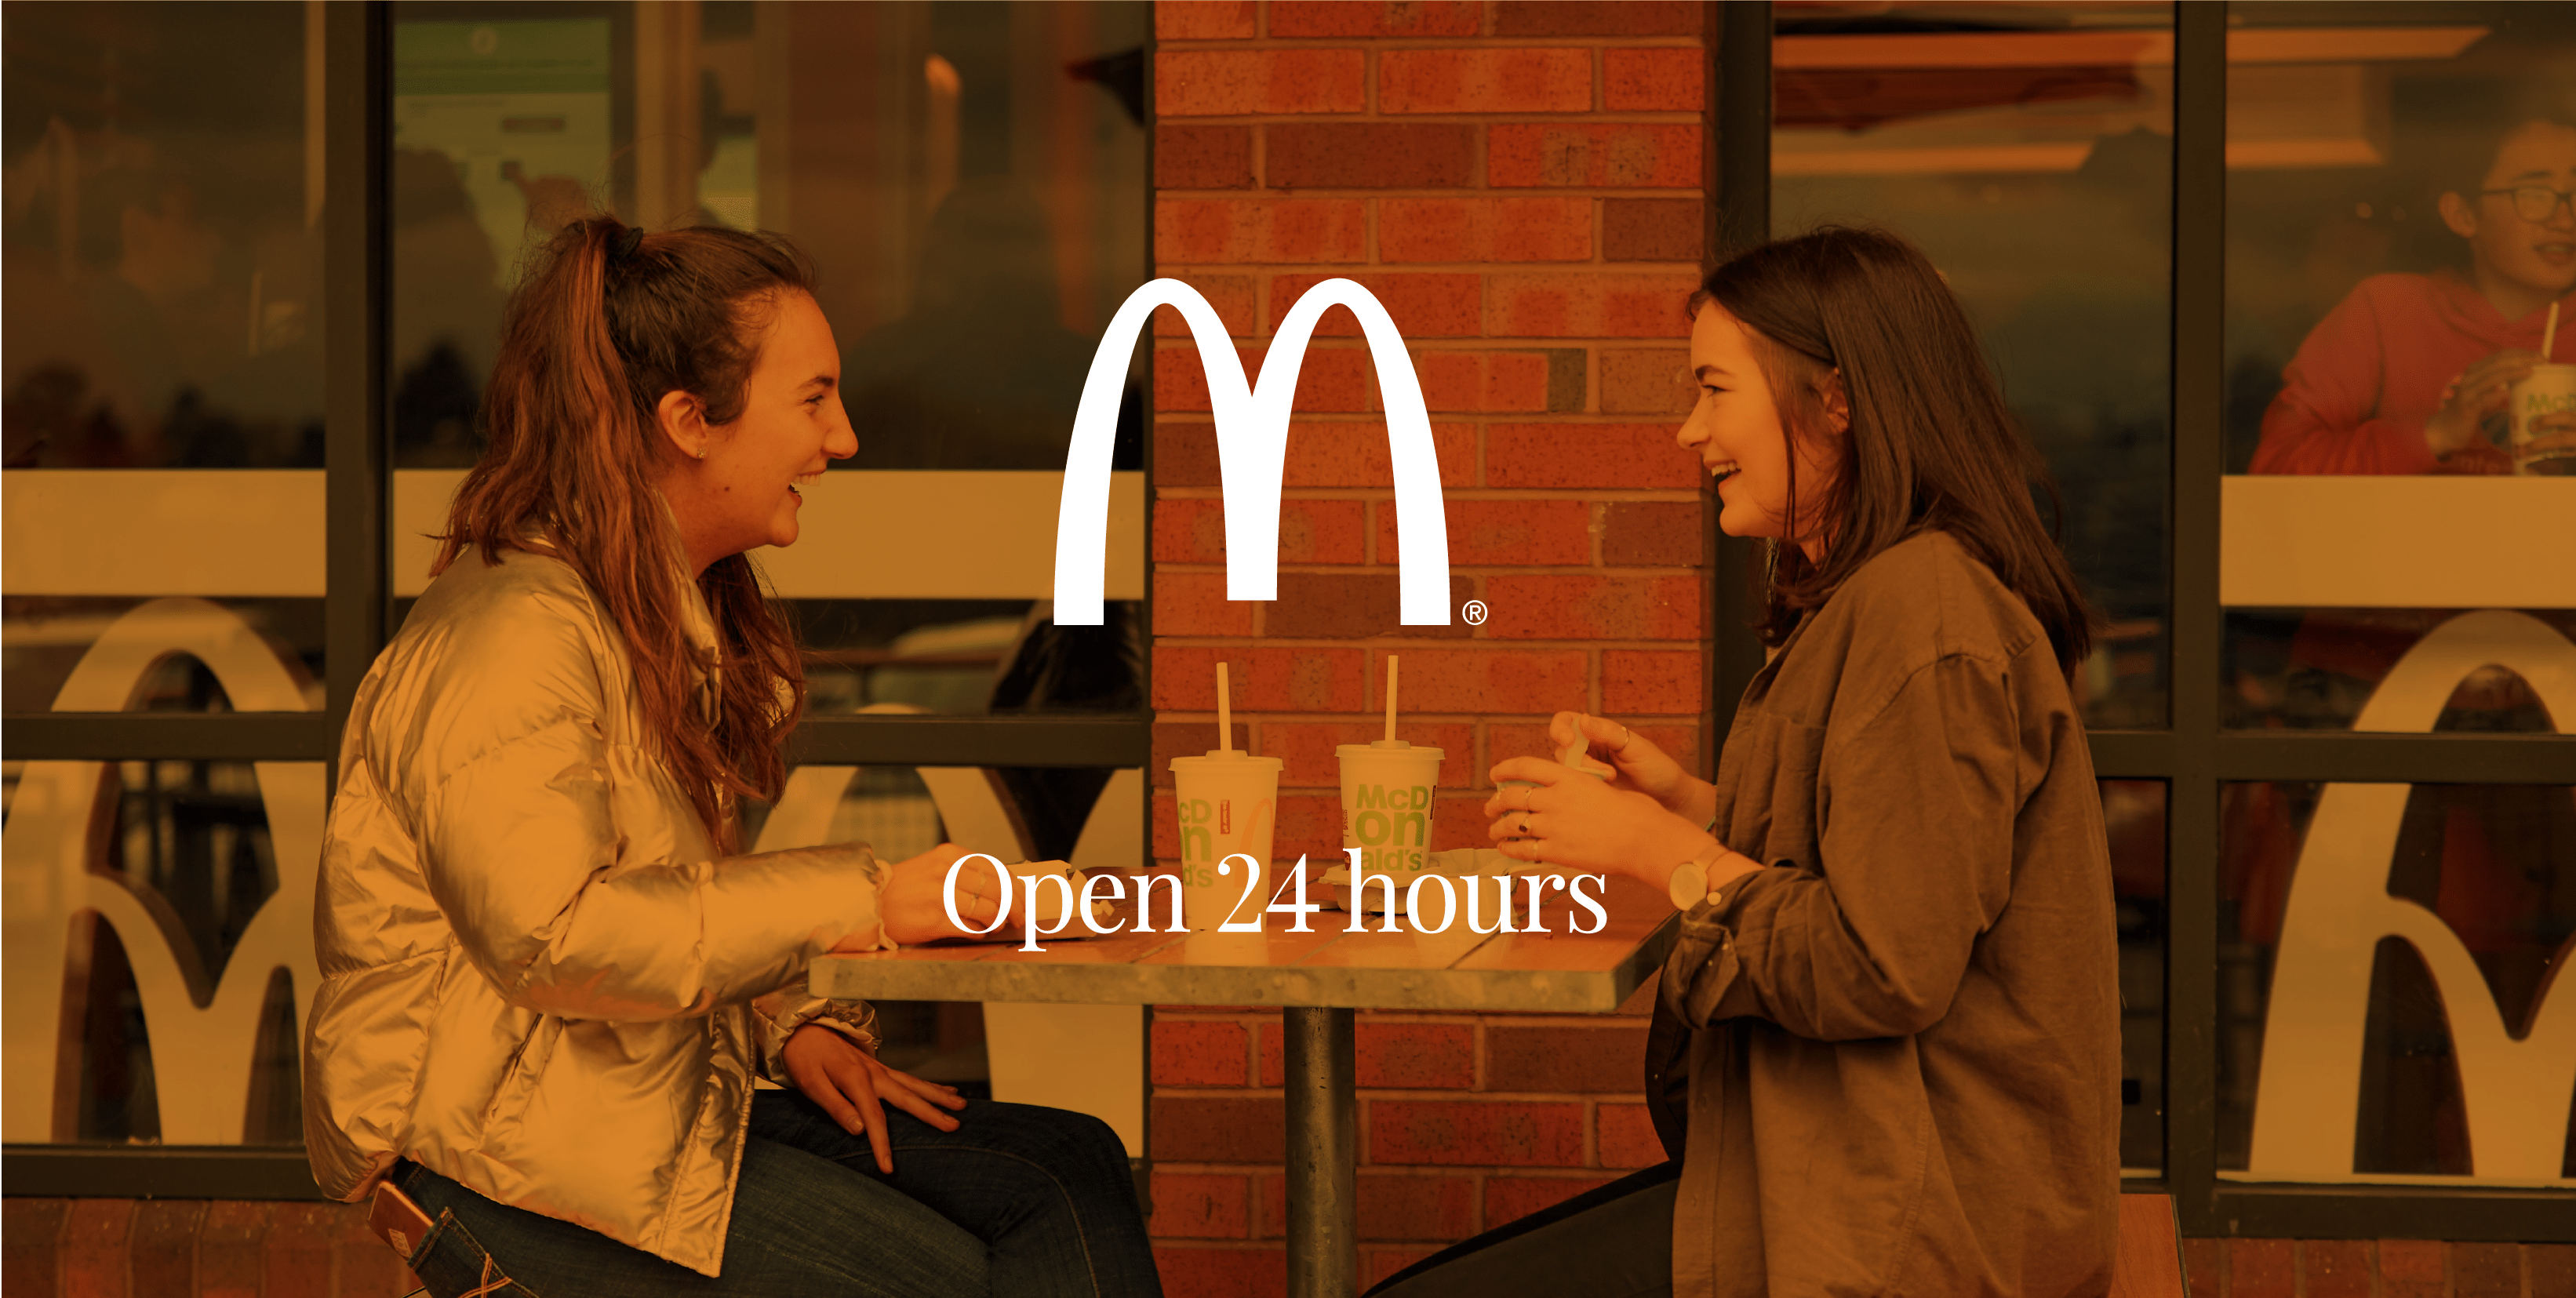 McDonalds Opening Hours